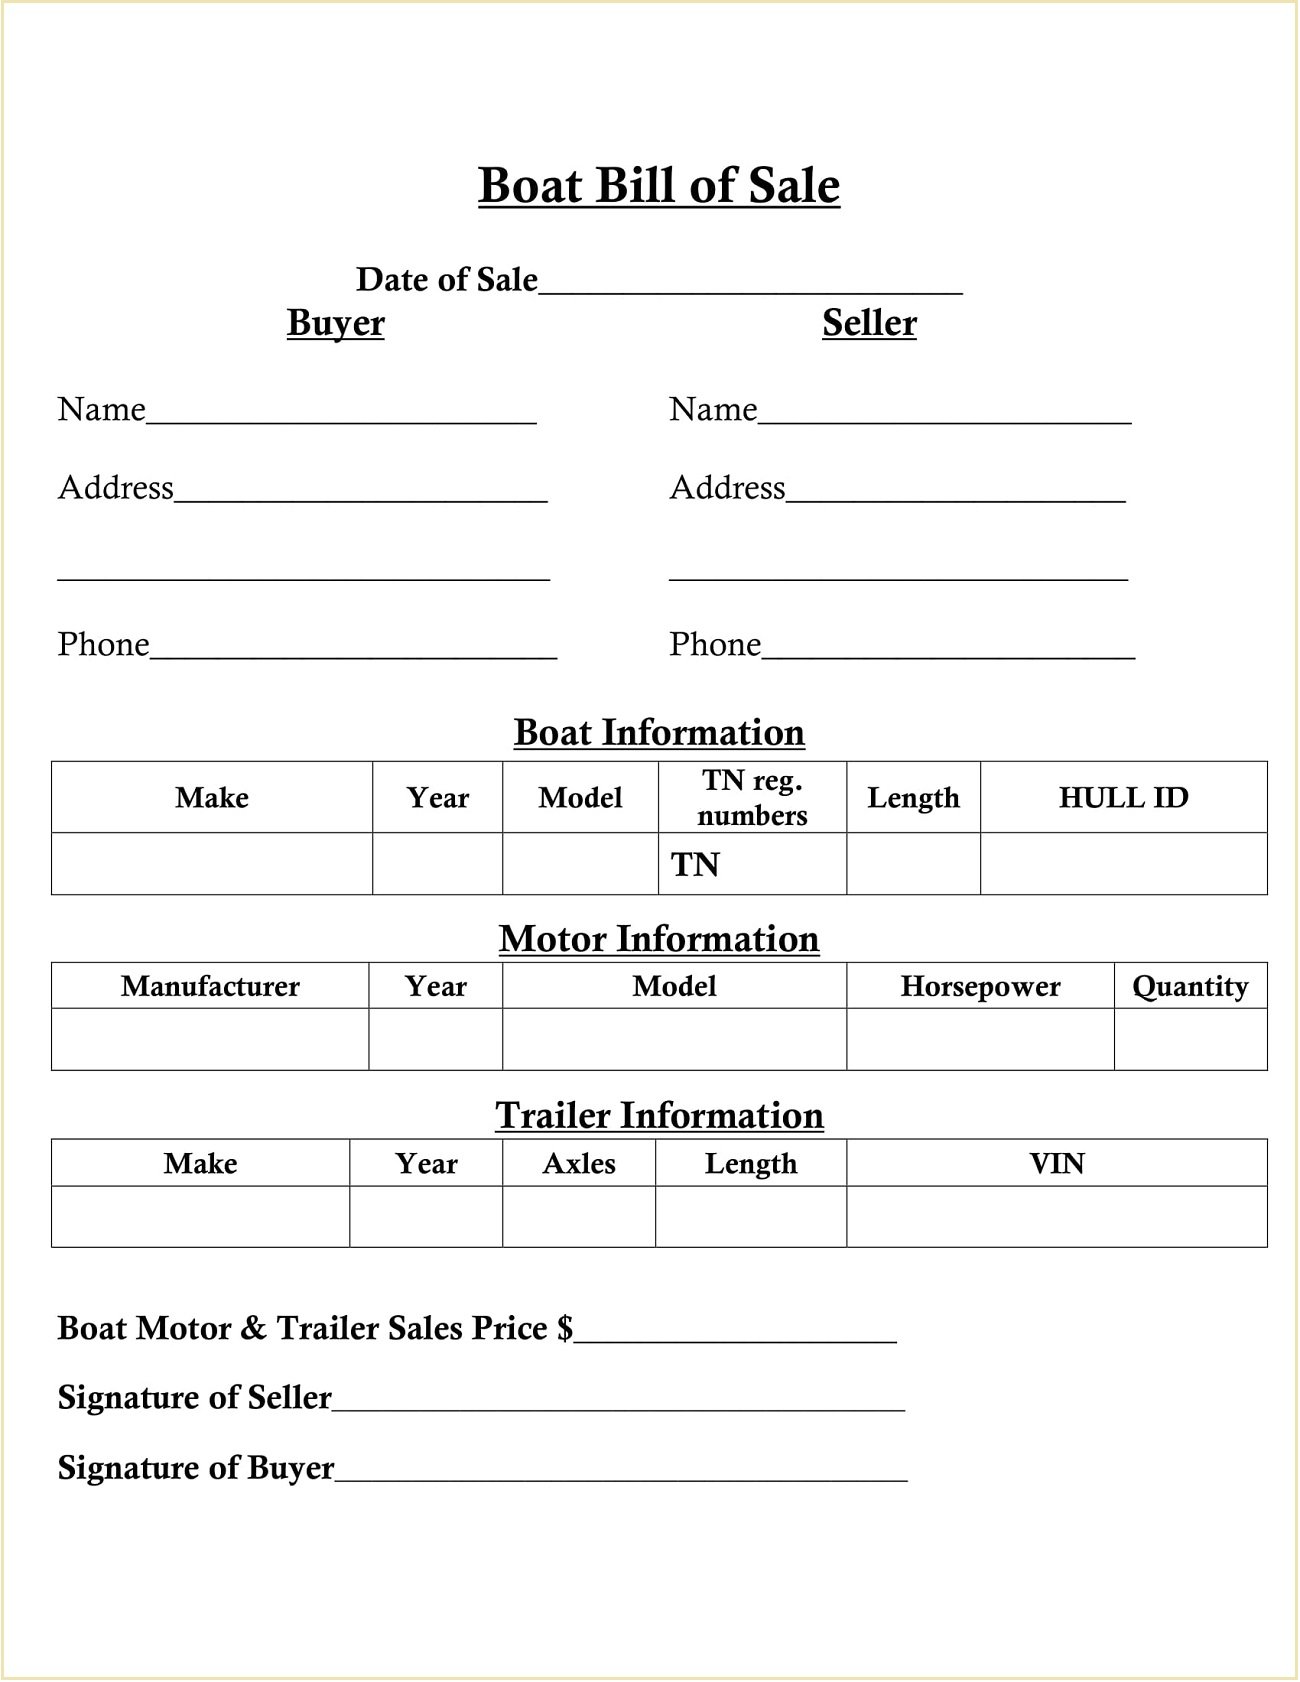 SImple Boat Motor Bill of Sale Sample PDF